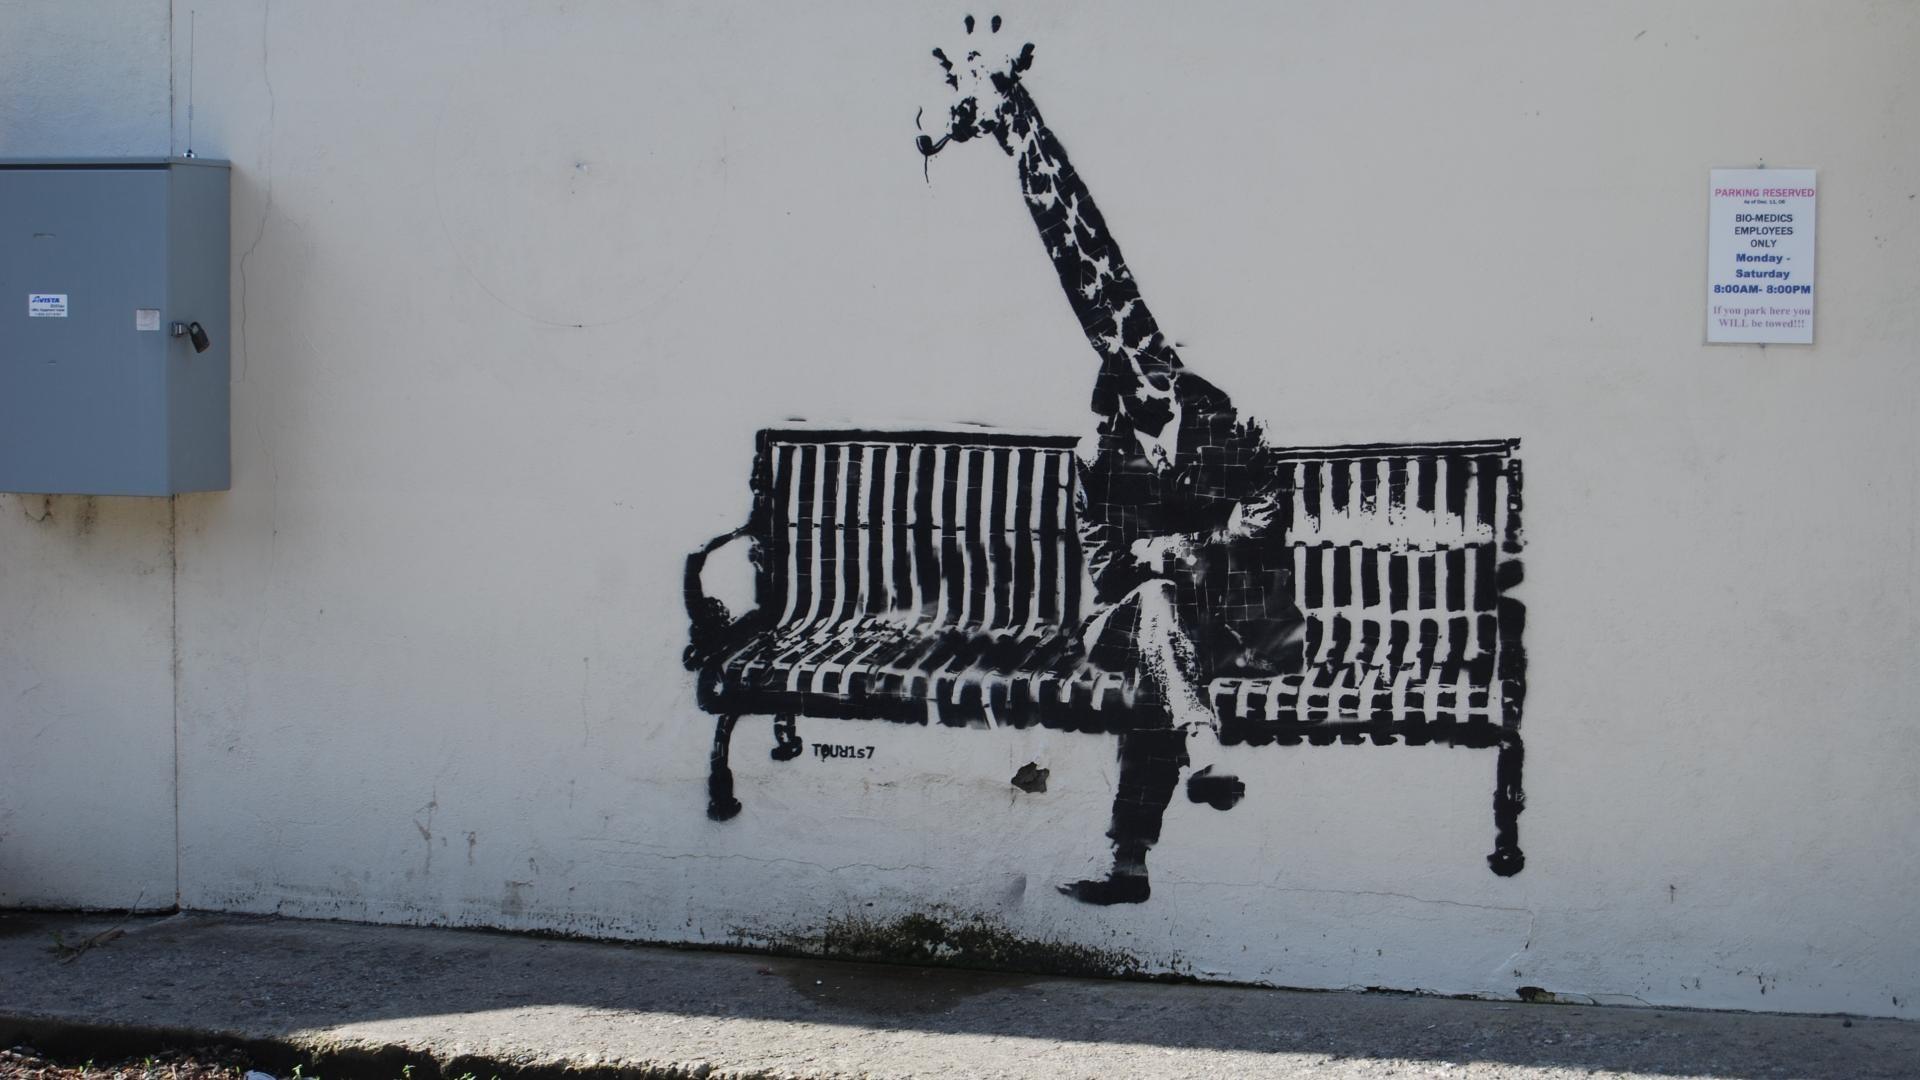 General artwork animals graffiti wall Banksy bench sitting legs  giraffes shadow street art